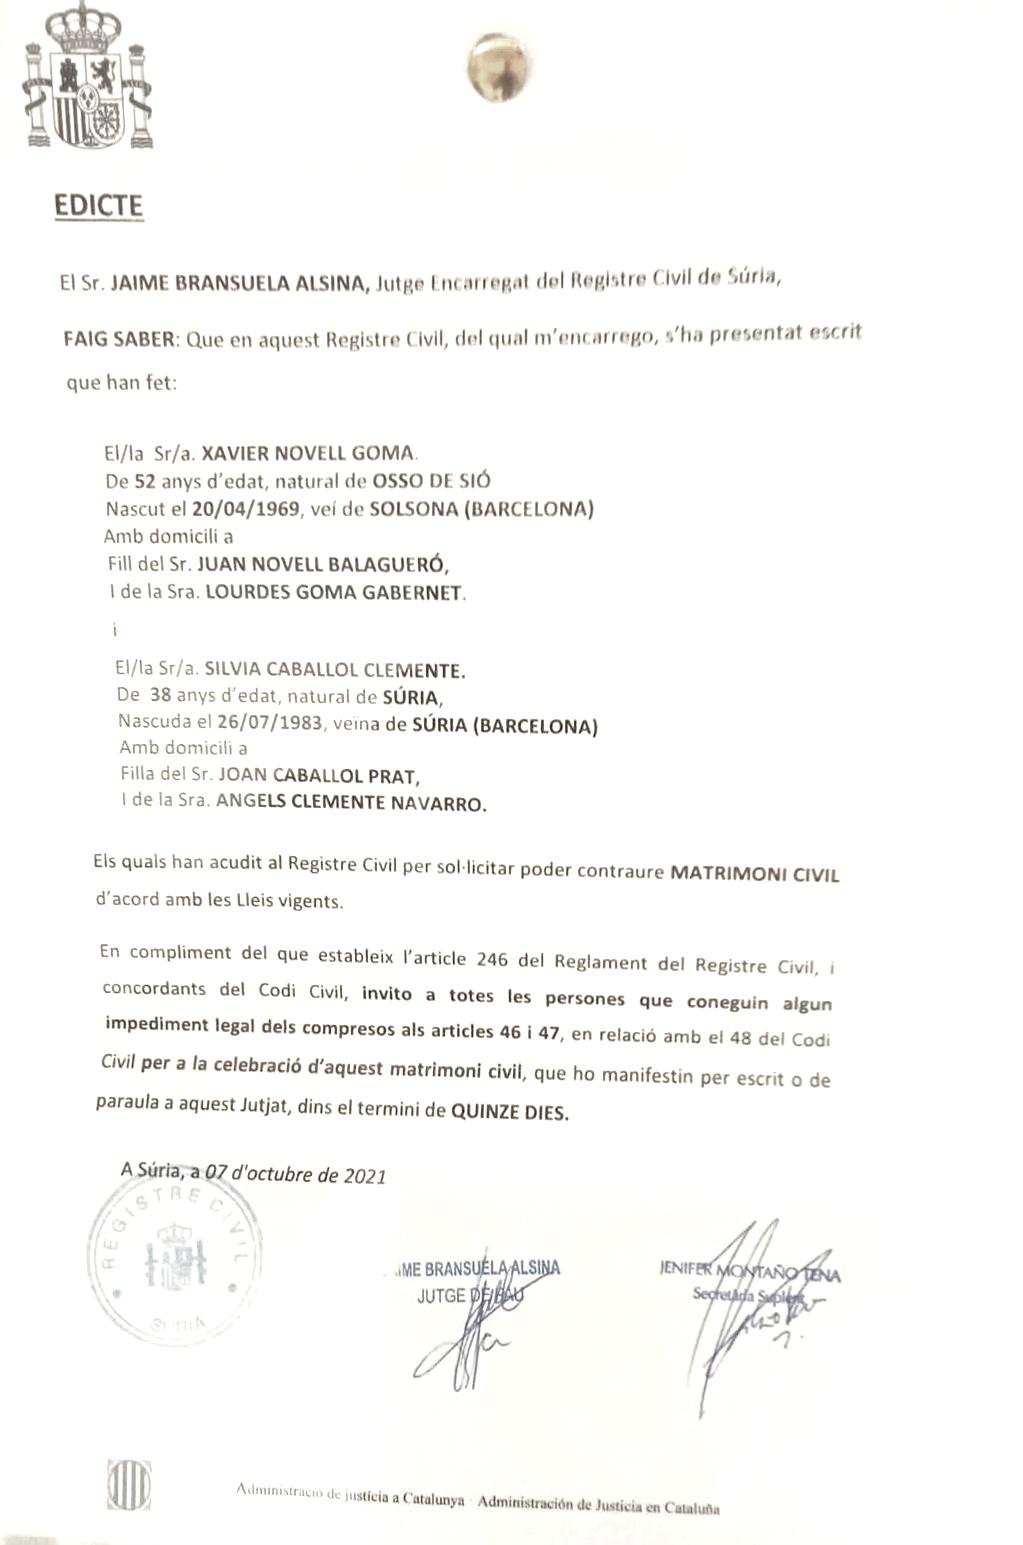 Documento del Registro Civil de Suria